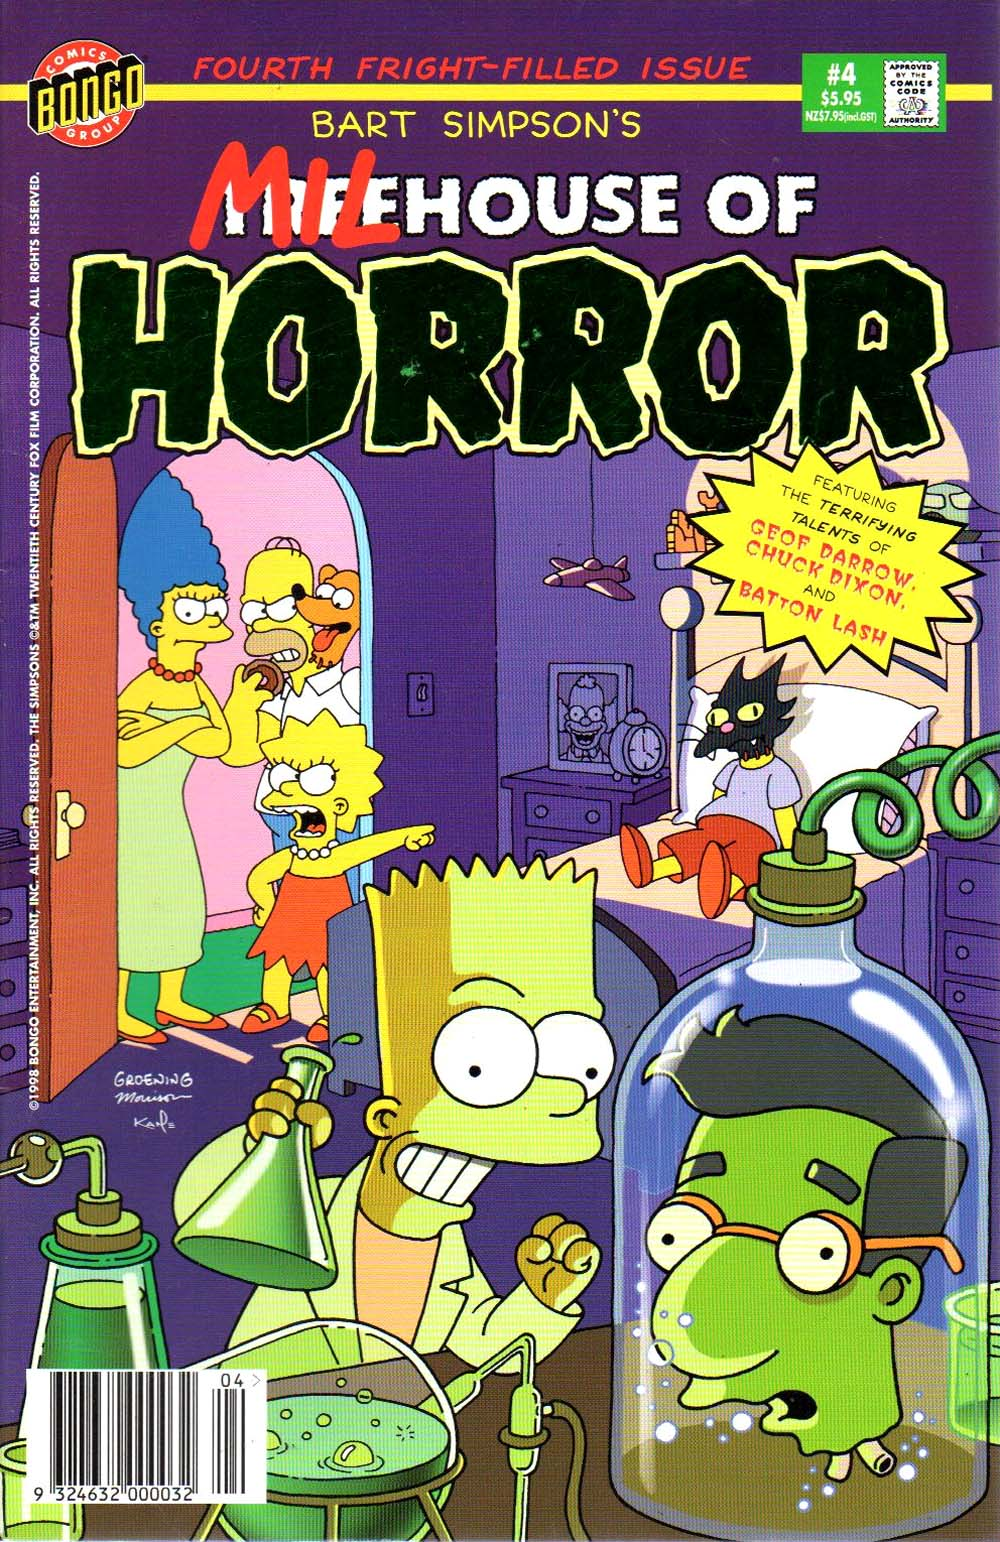 Bart Simpson's Treehouse of Horror (AU) 4 (2).jpg